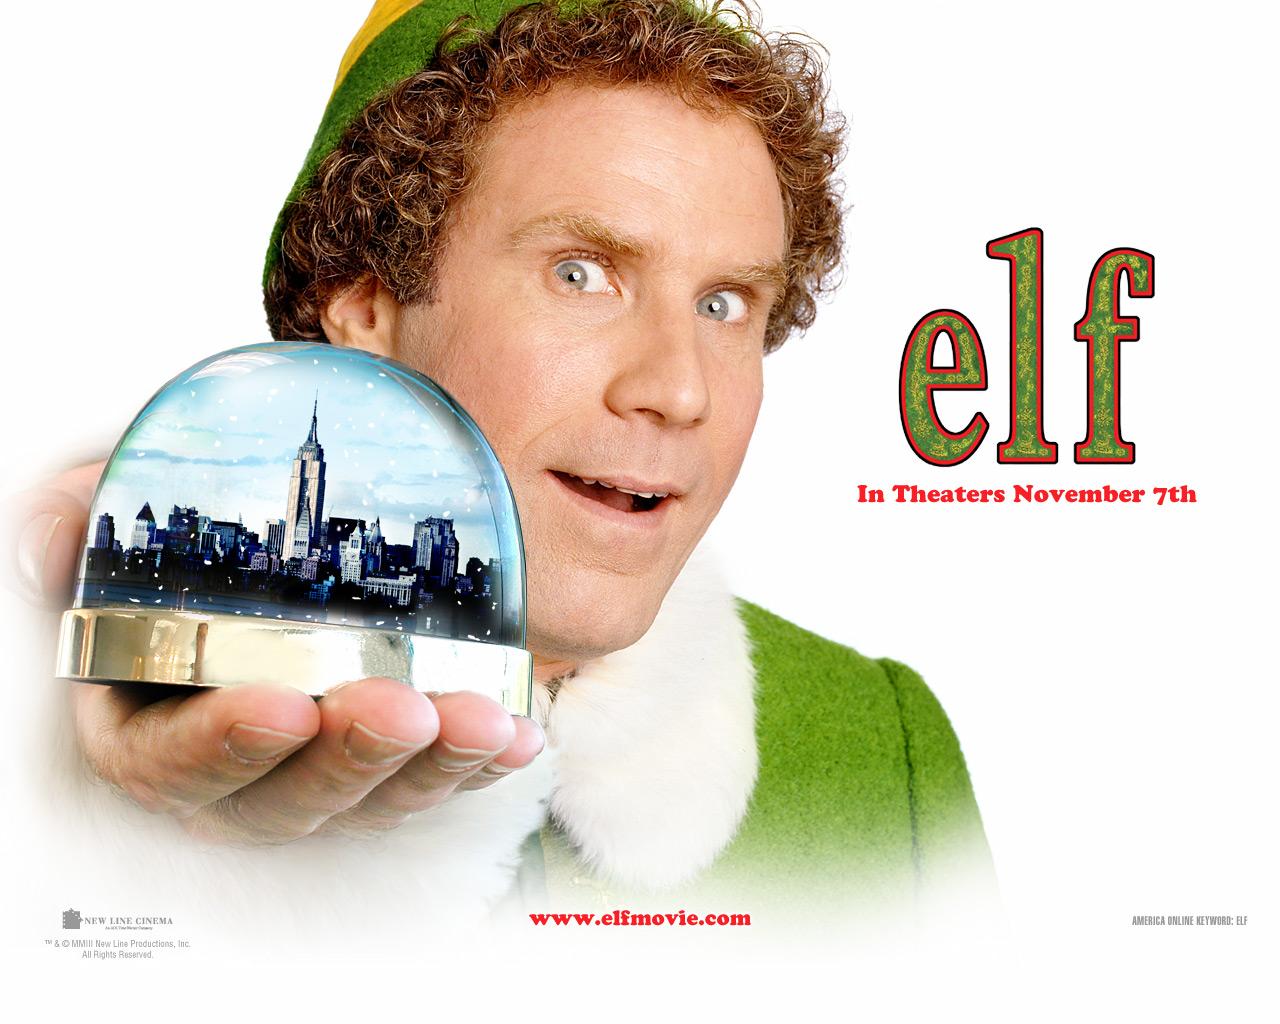 Elf Movie Wallpaper 1280x1024